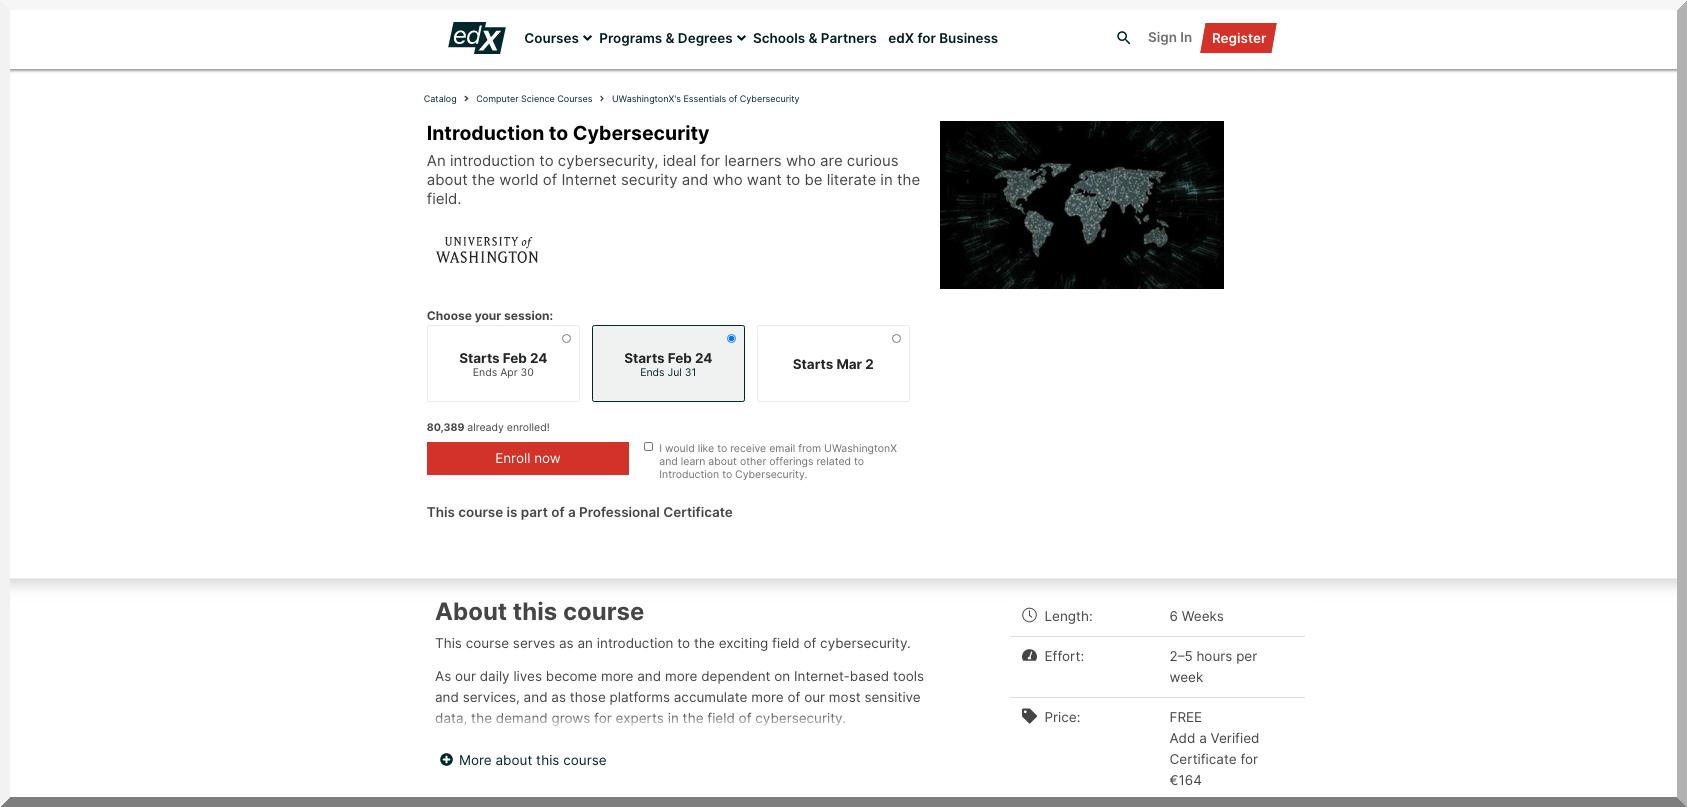 Introduction to Cybersecurity – University of Washington – edX